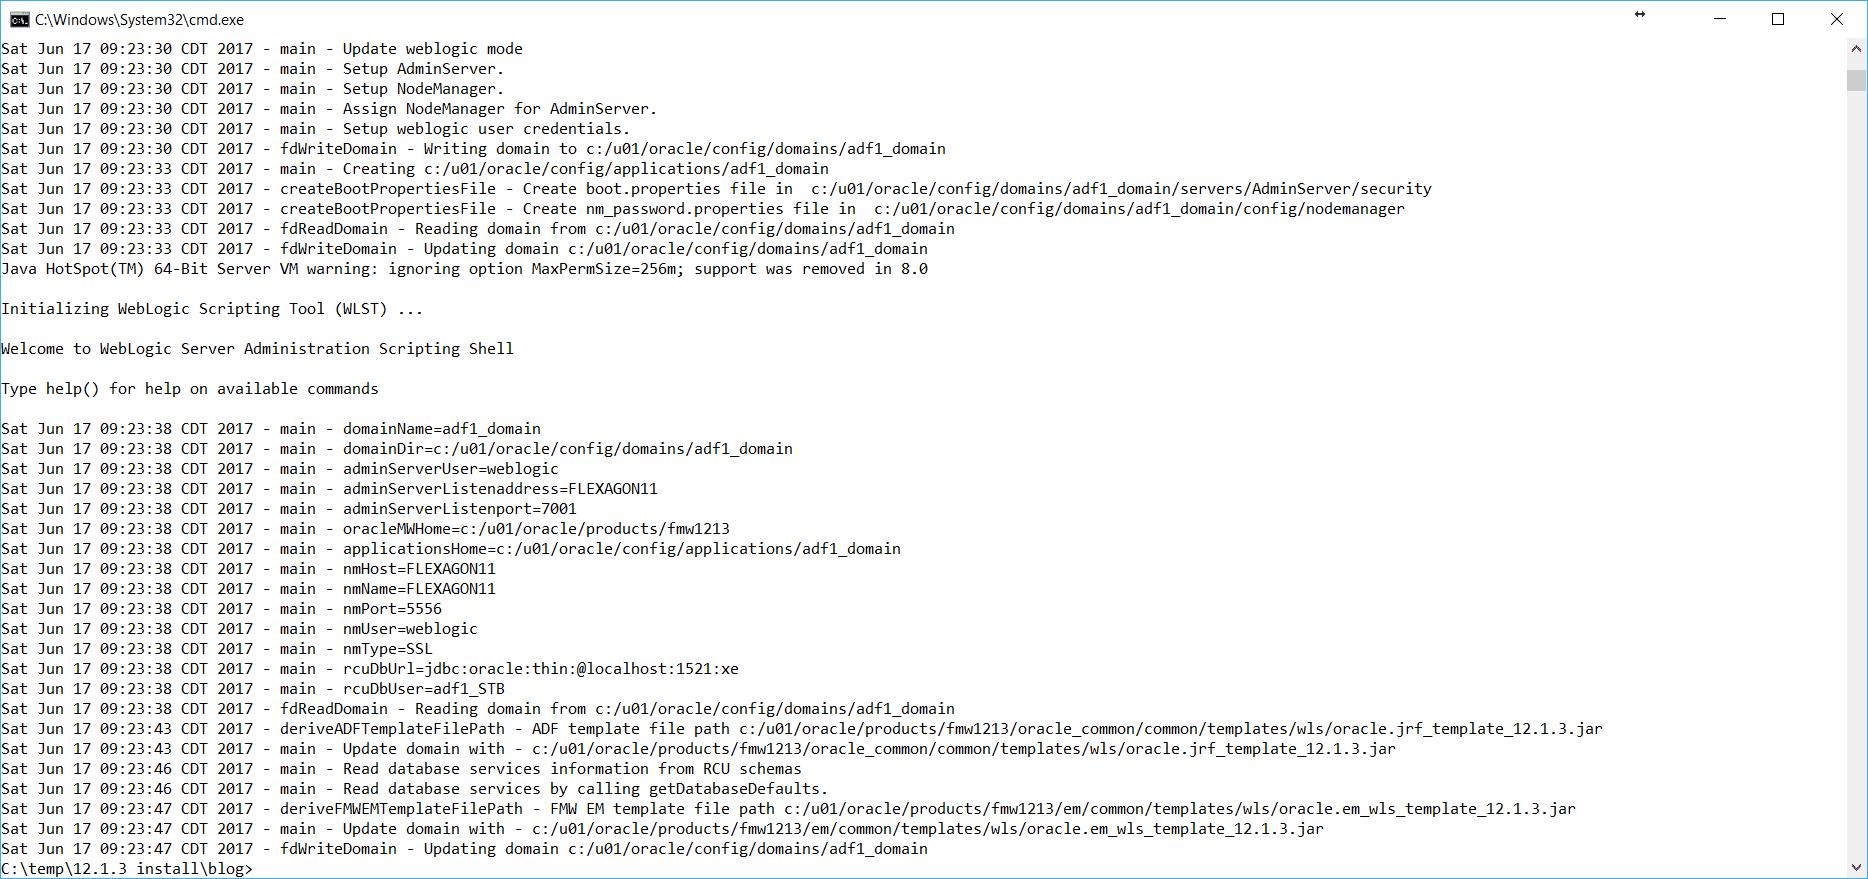 Automate Creation of ADF 12c WebLogic Domain - Flexagon